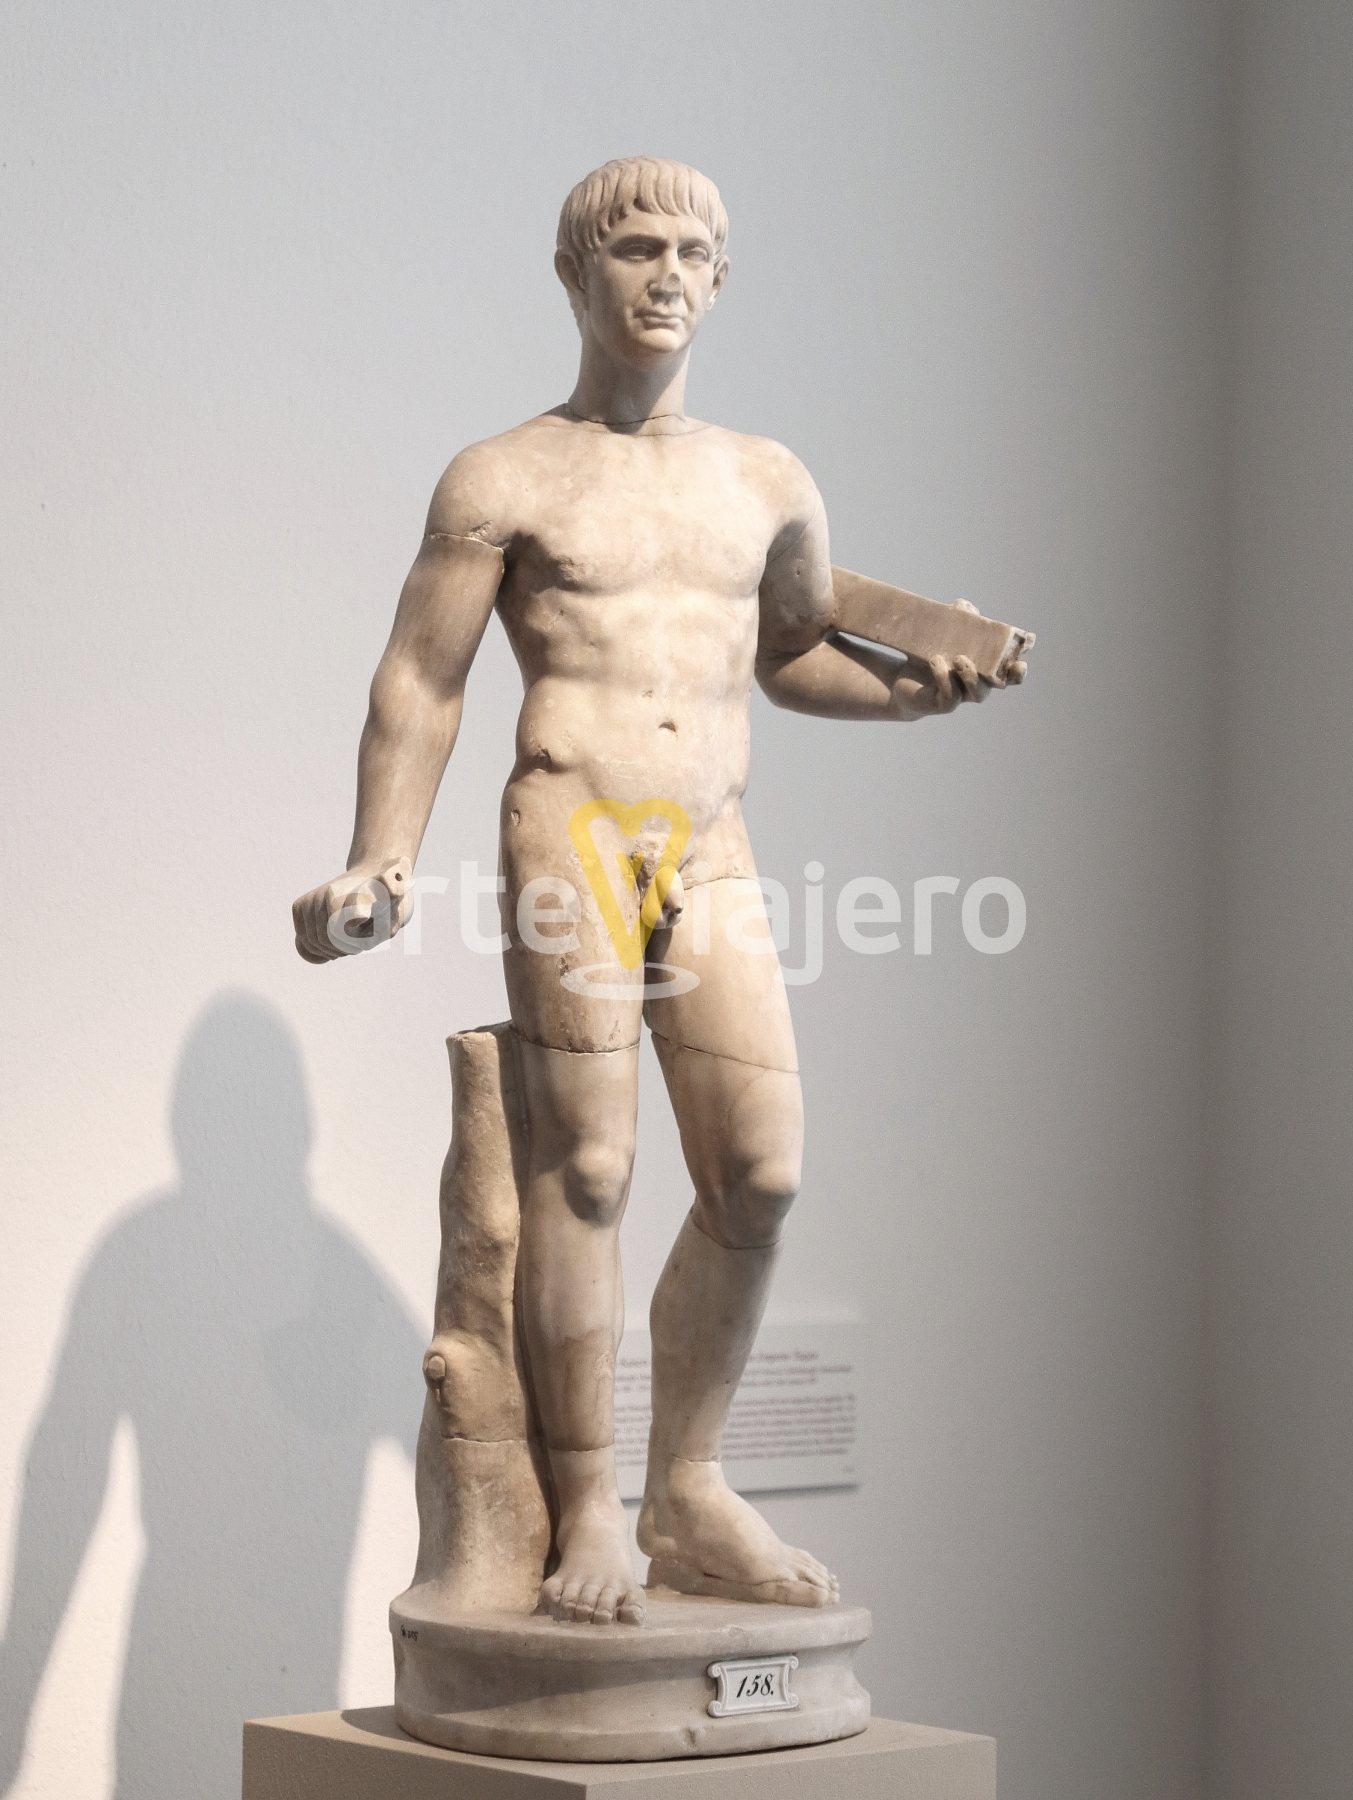 escultura de trajano